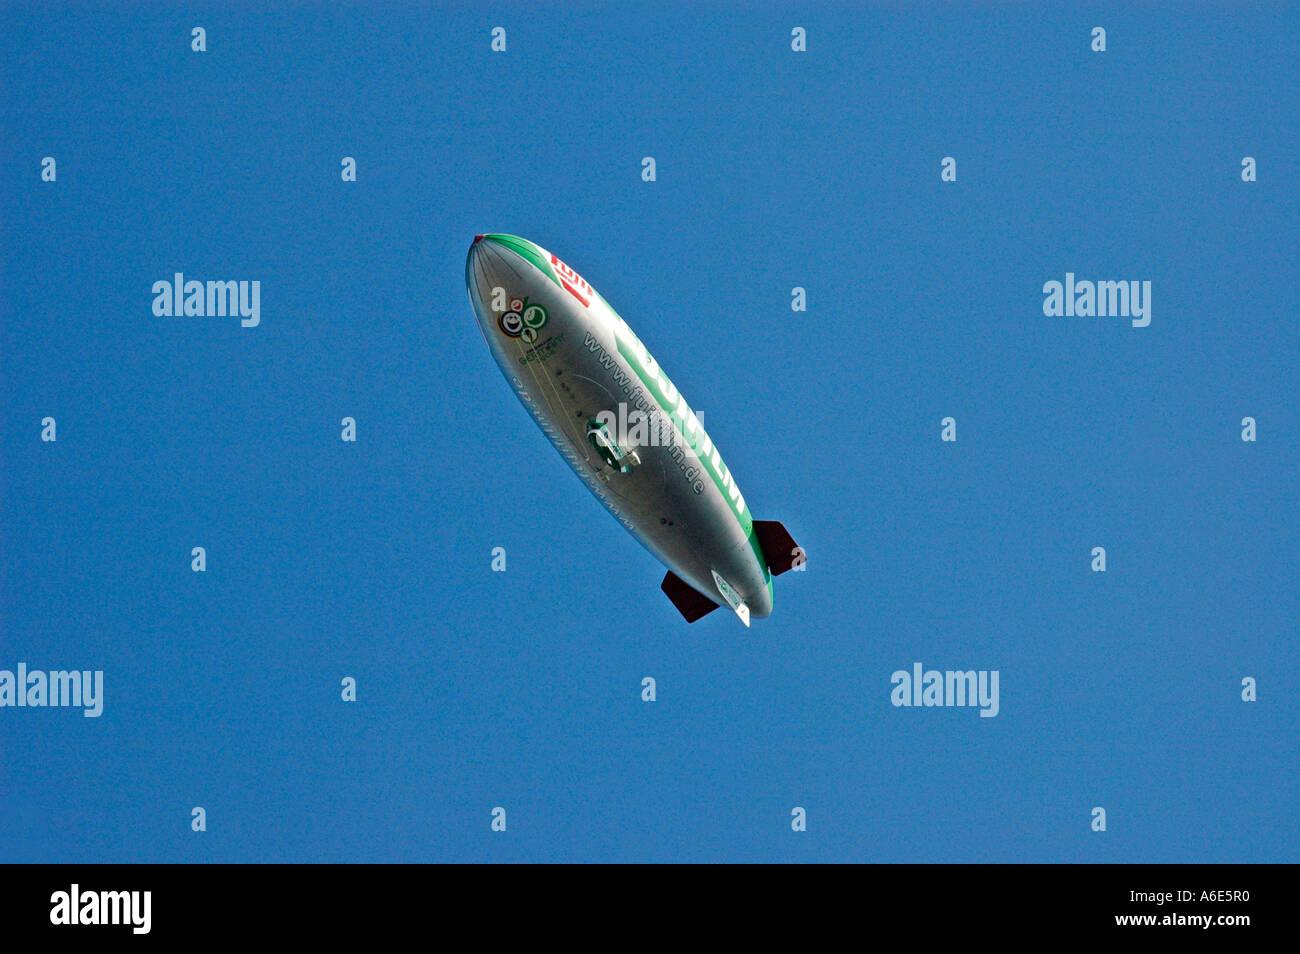 Zeppelin, dirigible, blimp, airship, fuji, fujifilm, flight object, advertisement, advertising, NRW, Nordrhein Westphalia - Stock Image